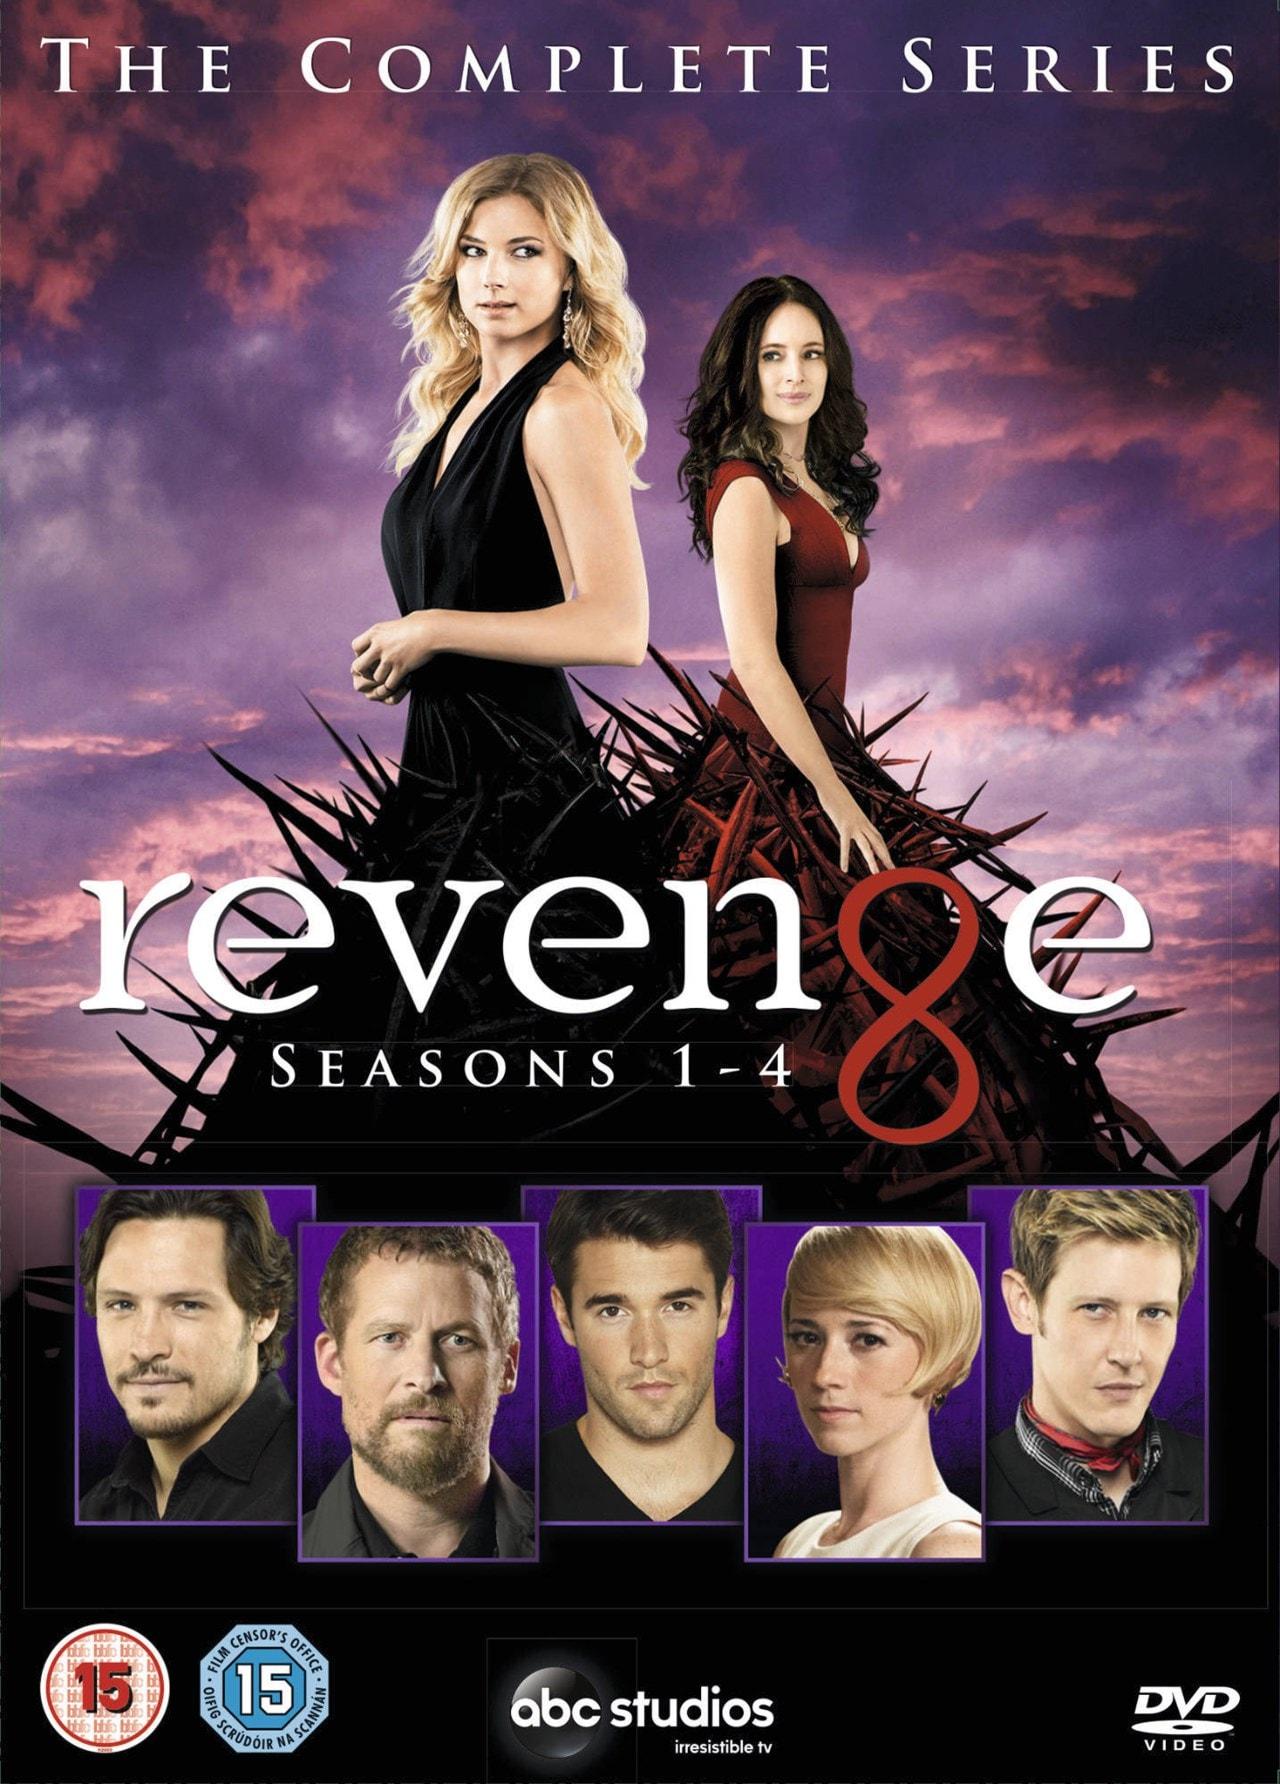 Revenge: Seasons 1-4 - The Complete Series - 1